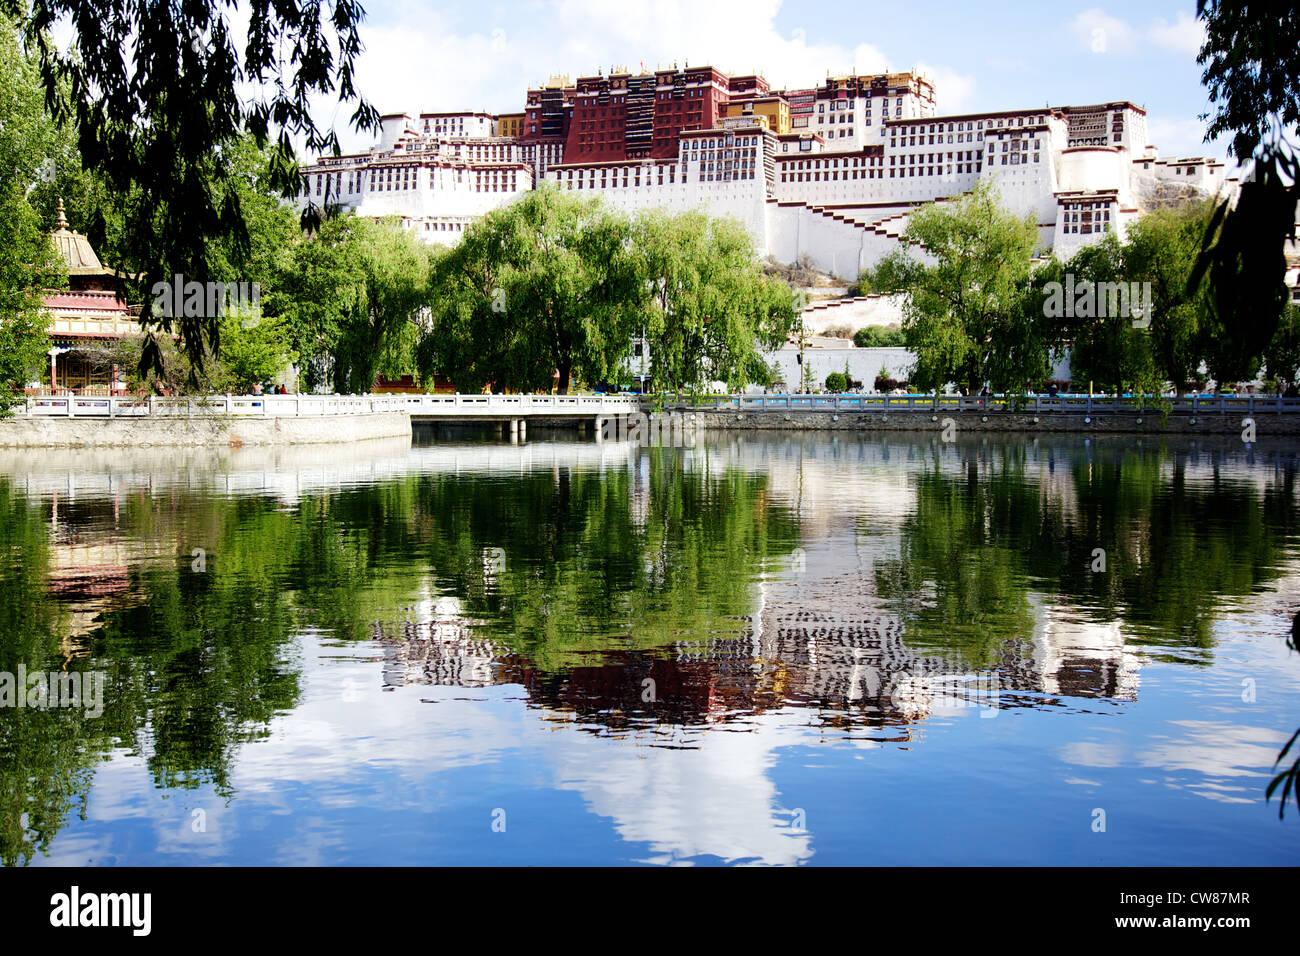 The Potala Palace Lhasa Tibet day reflection - Stock Image